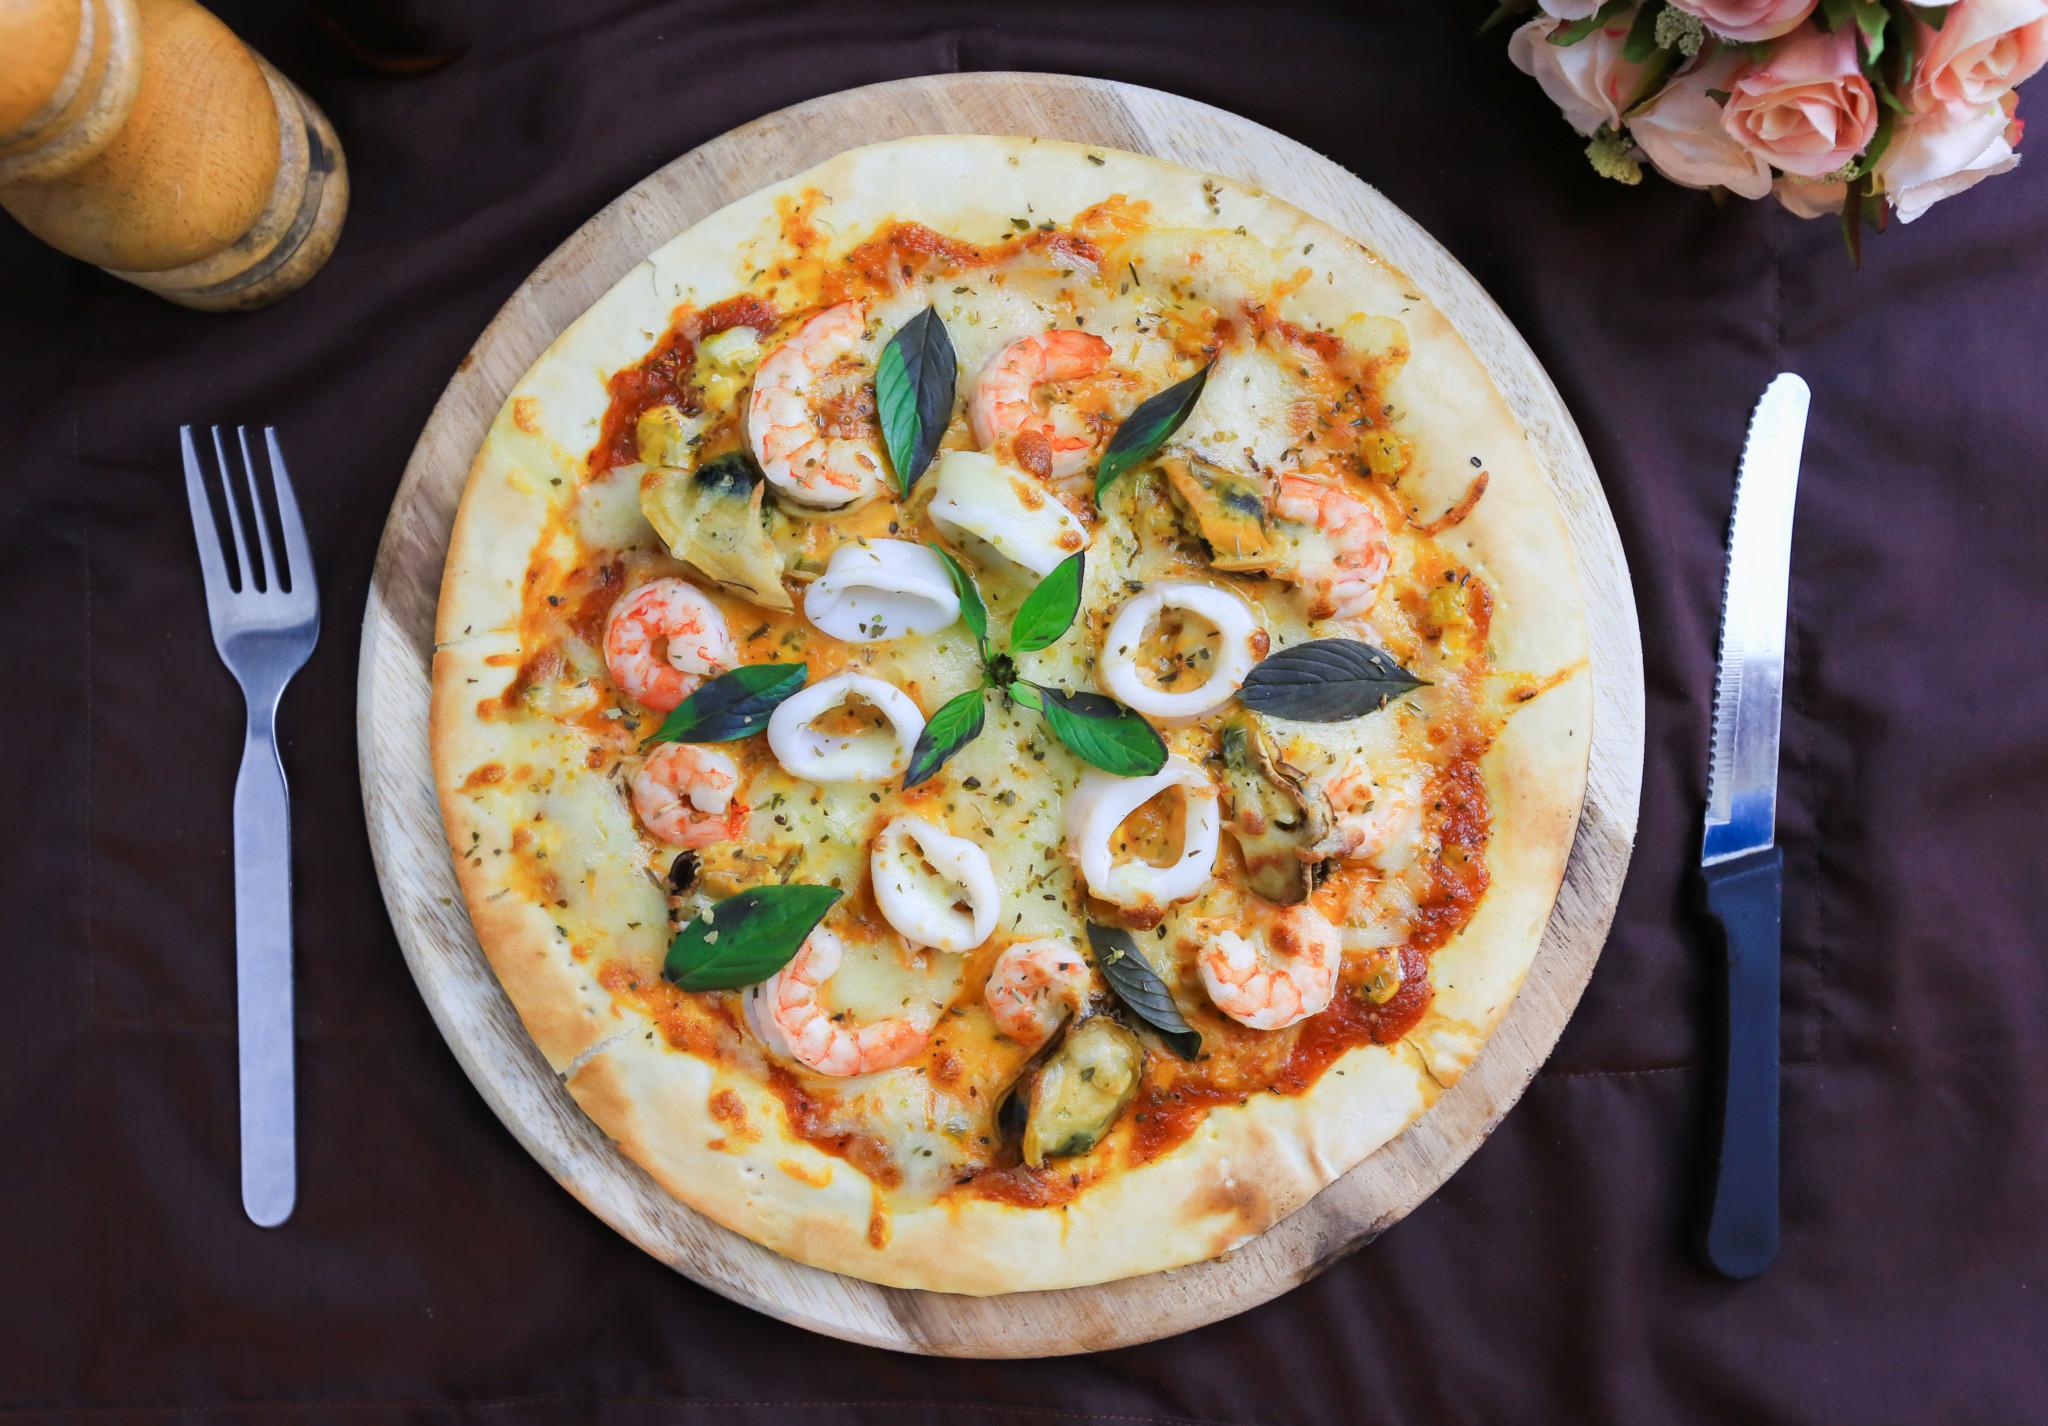 Shrimp, Oyster and Calamari Pizza